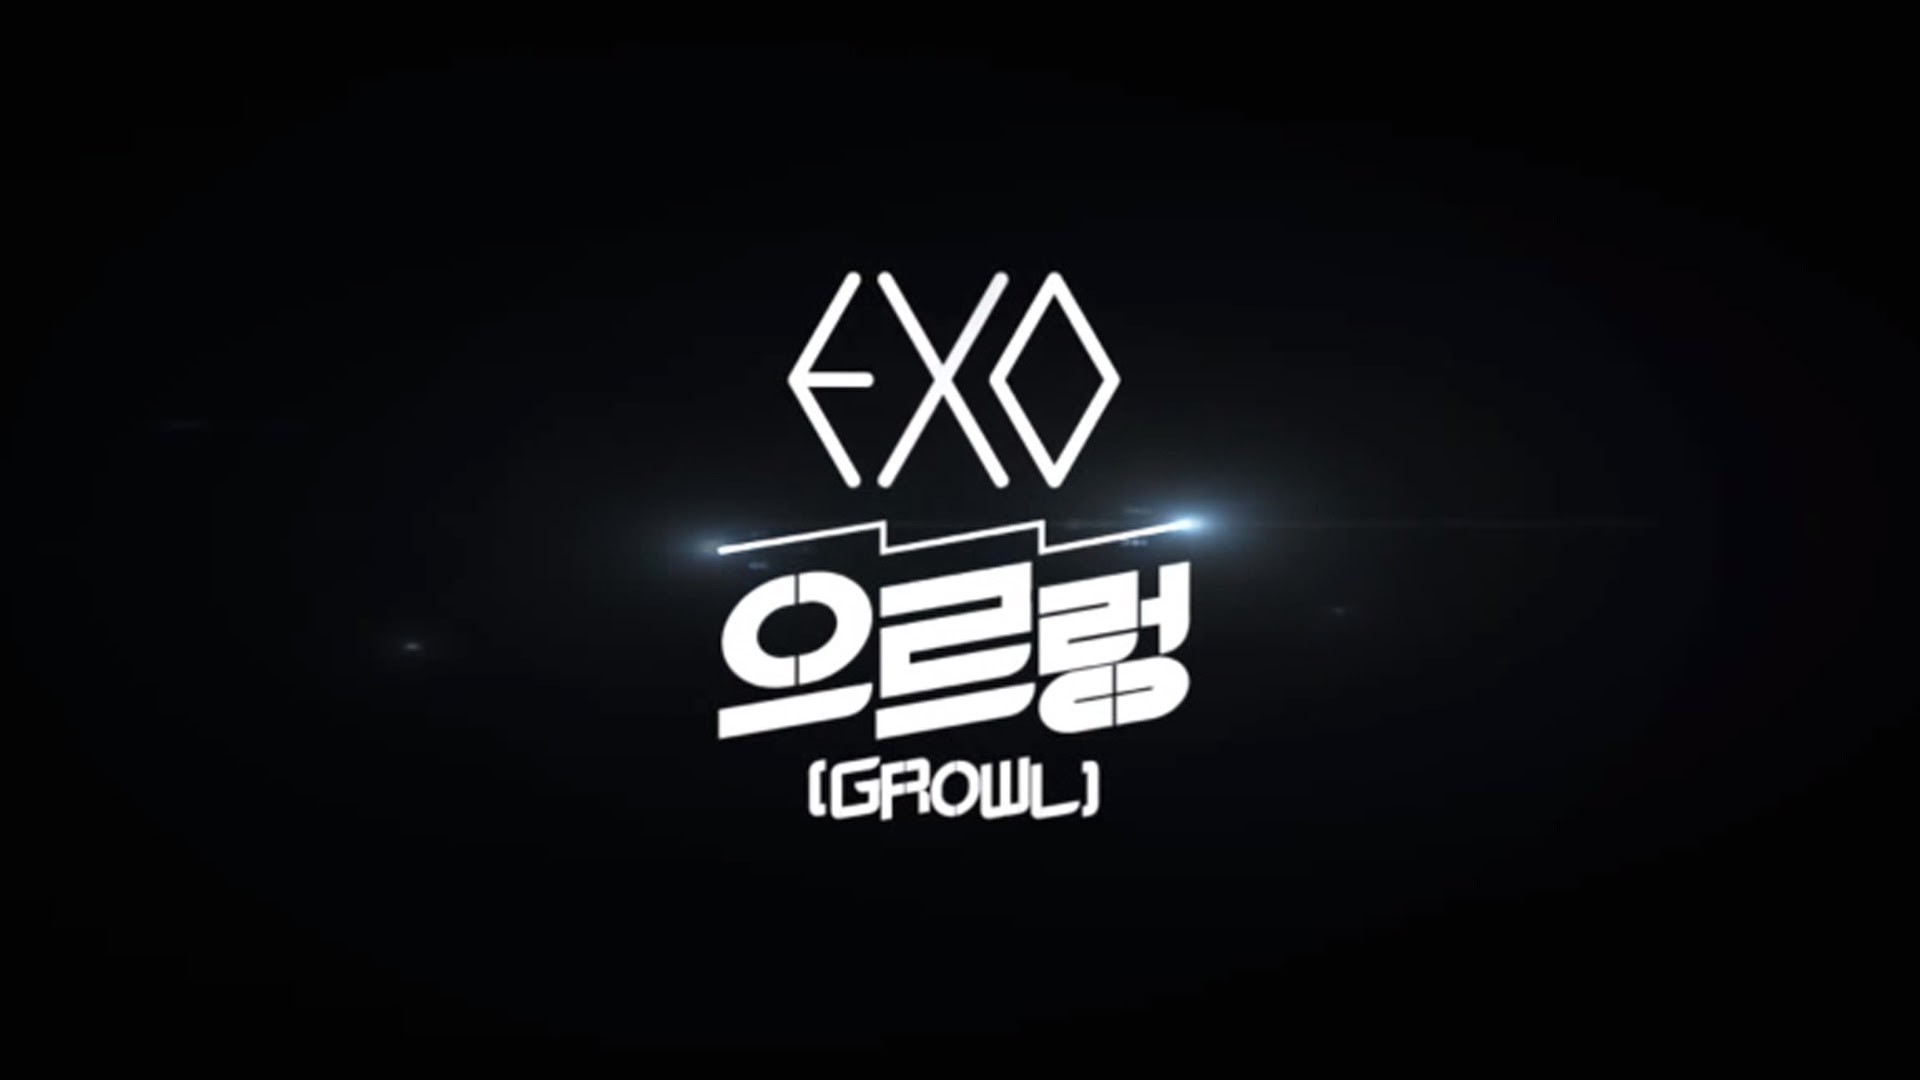 Exo Wallpaper Growl Cover photo